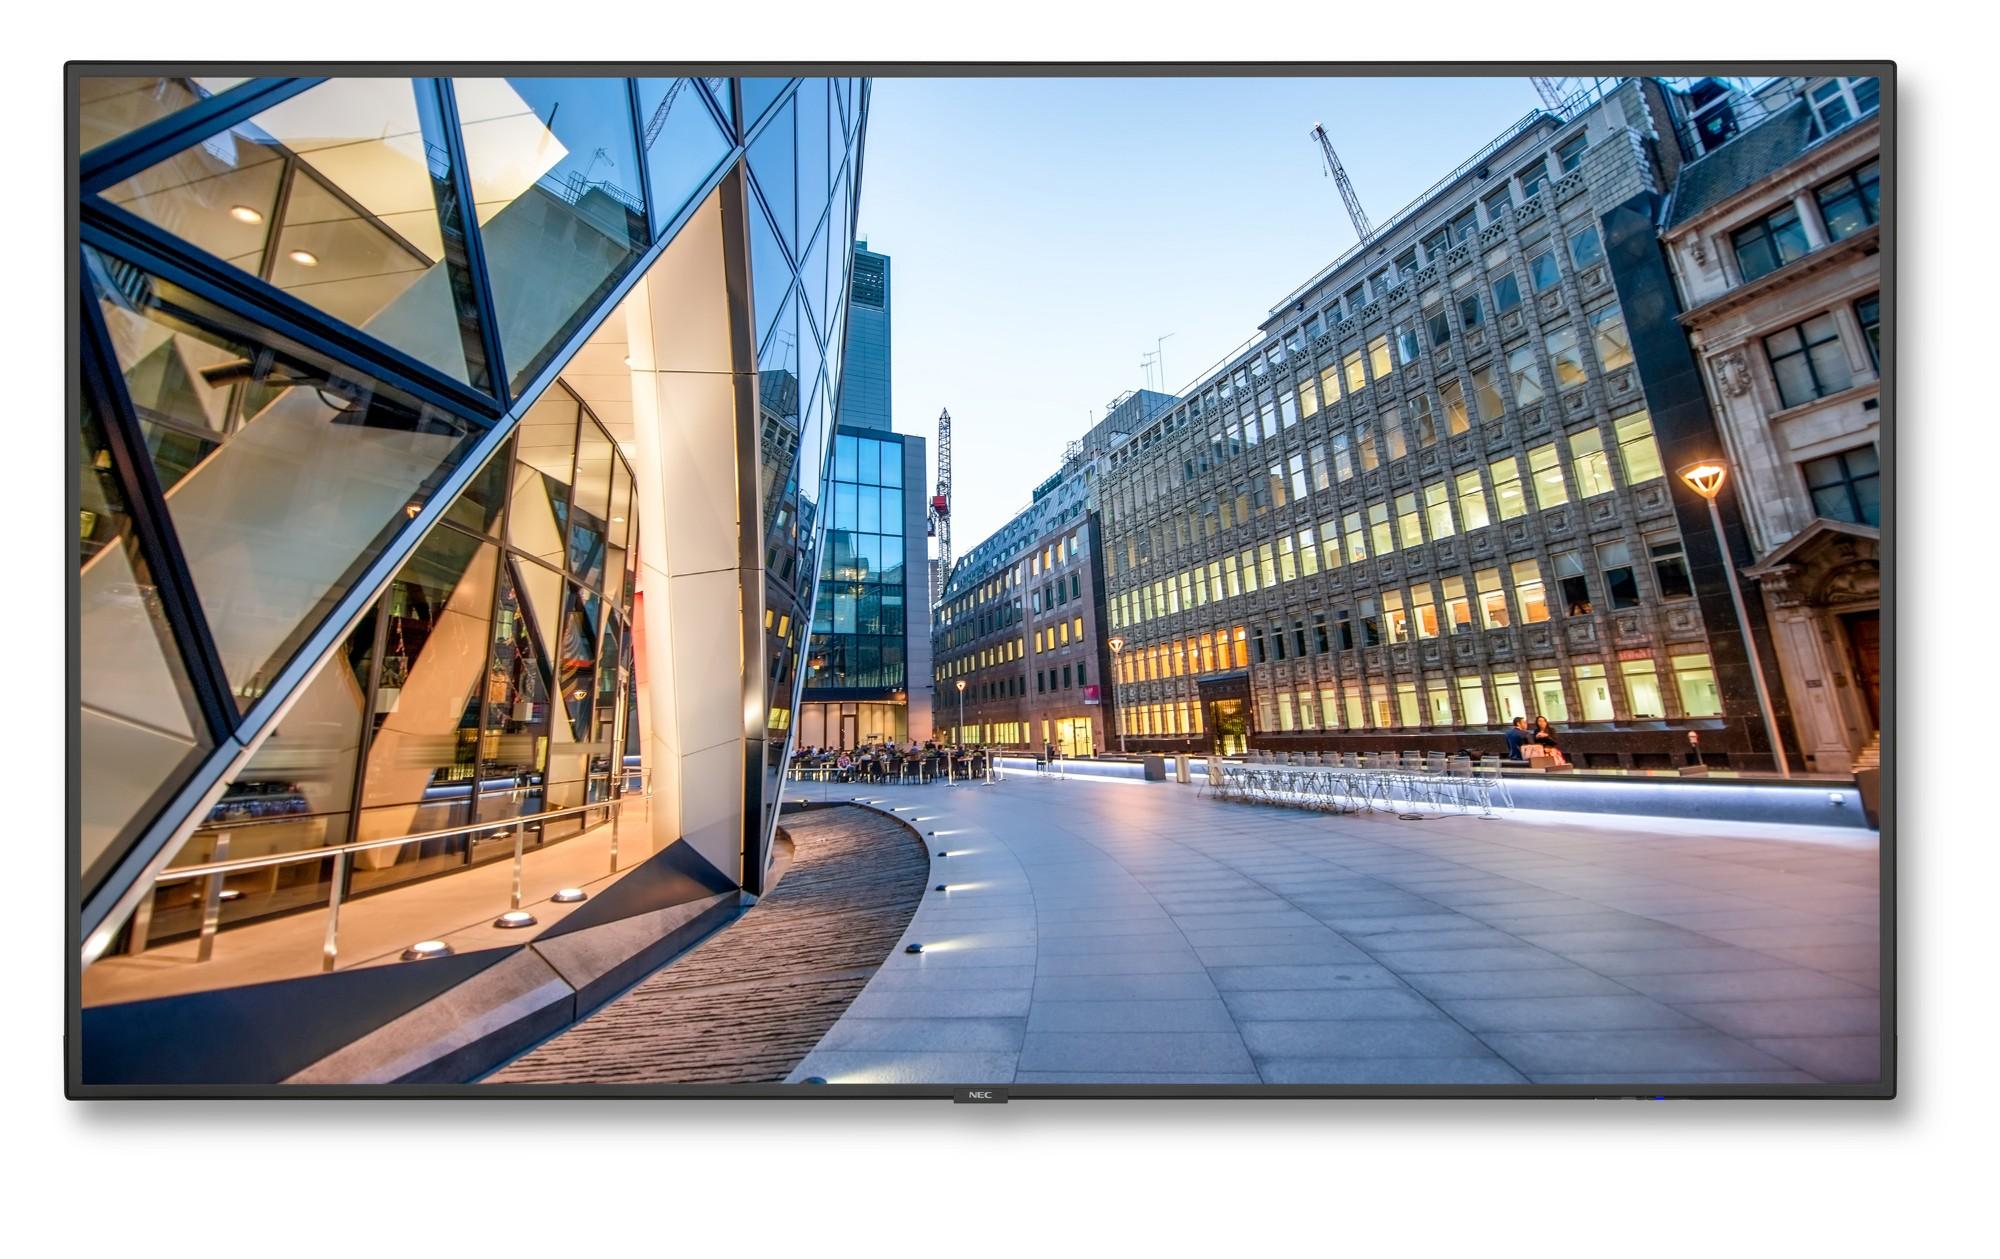 Large Format Display - Multisync C981q - 98in - 3840x2160 (uhd)